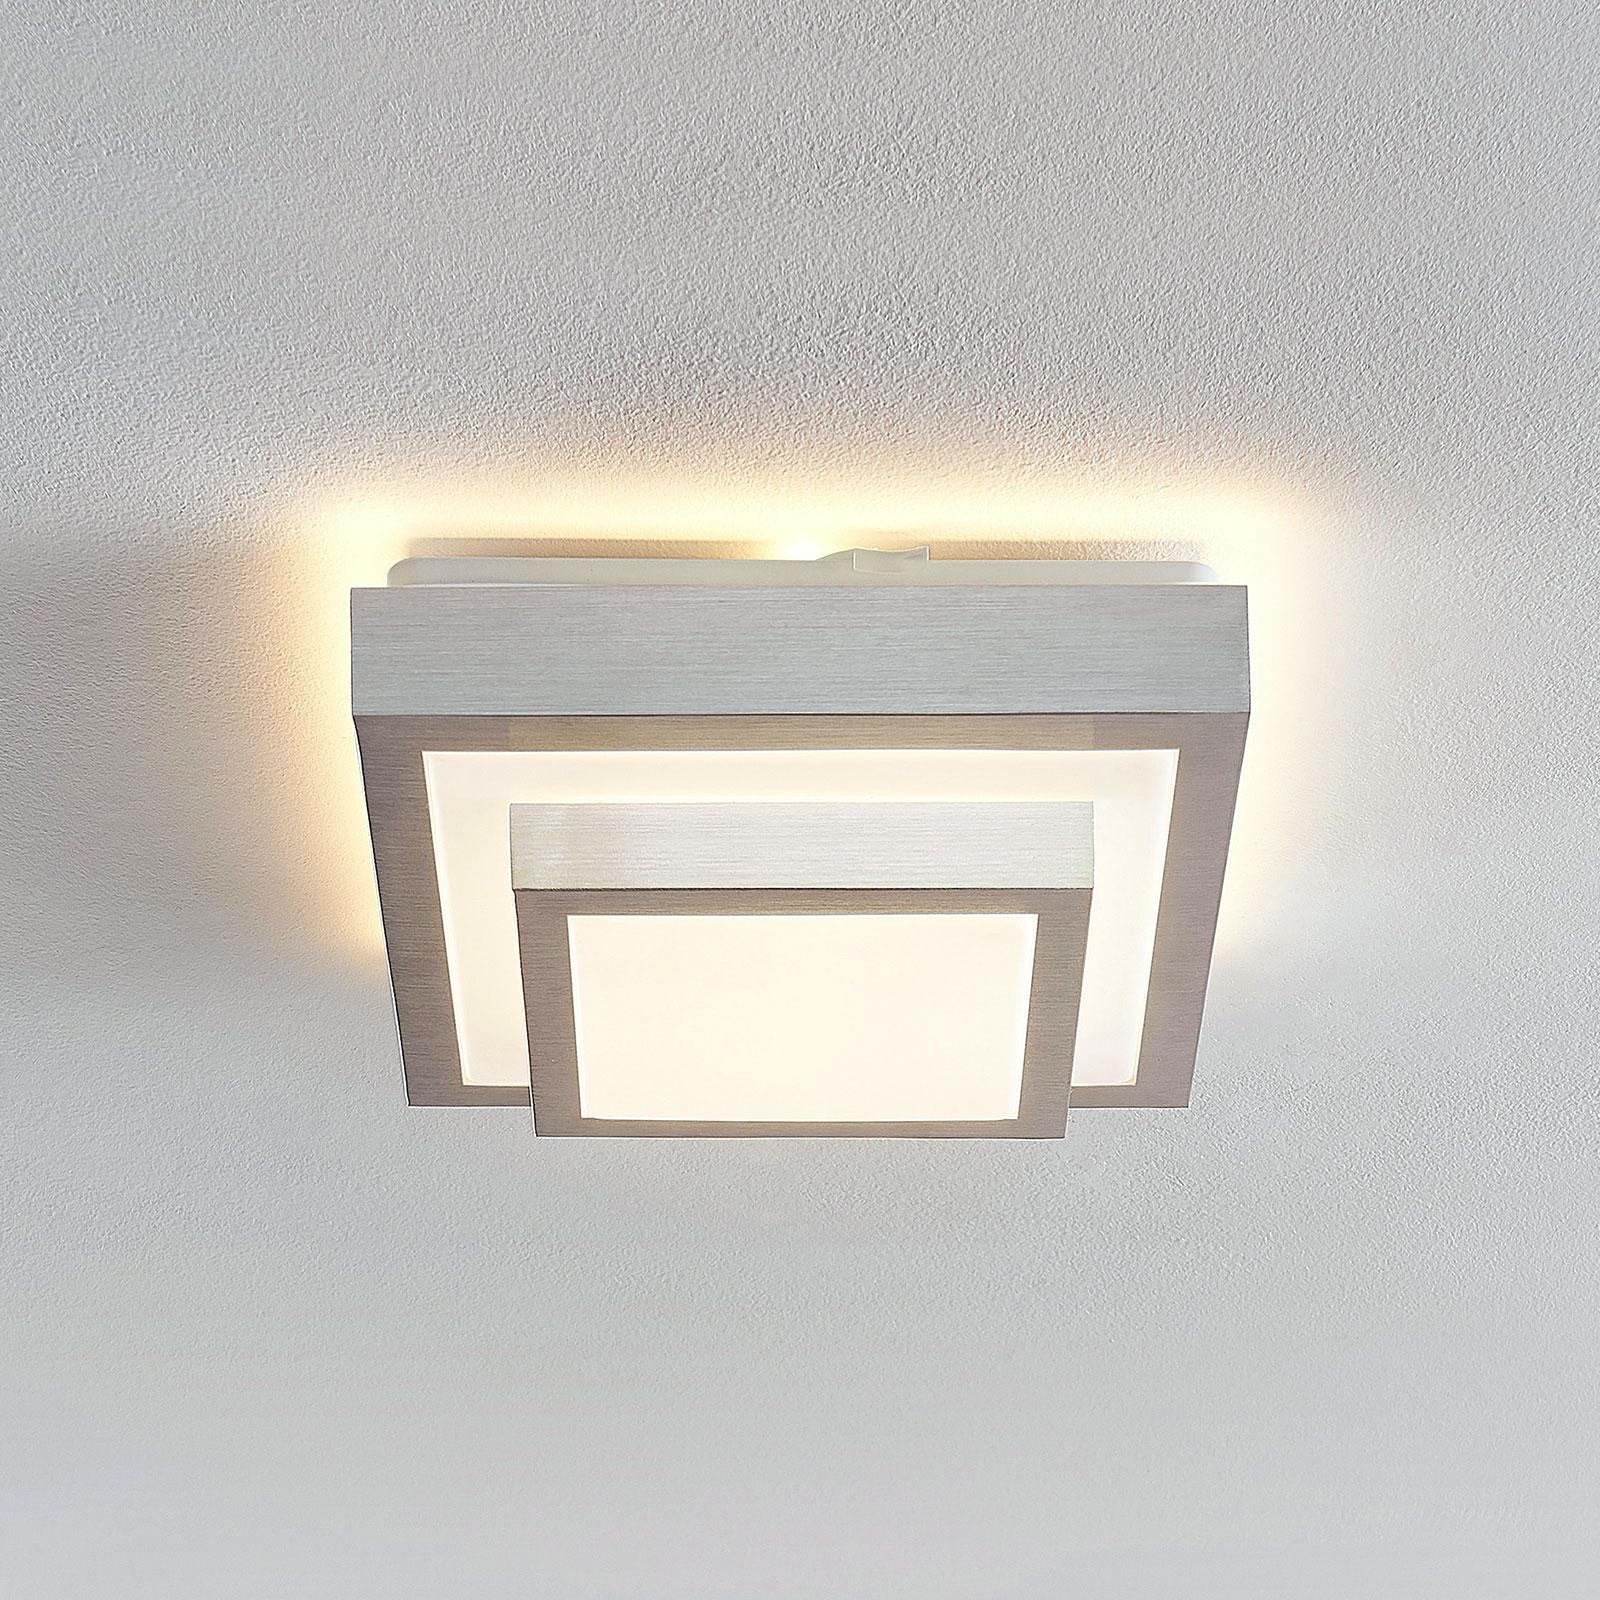 Lindby Mirco LED -kattovalaisin kulmikas, 27 cm